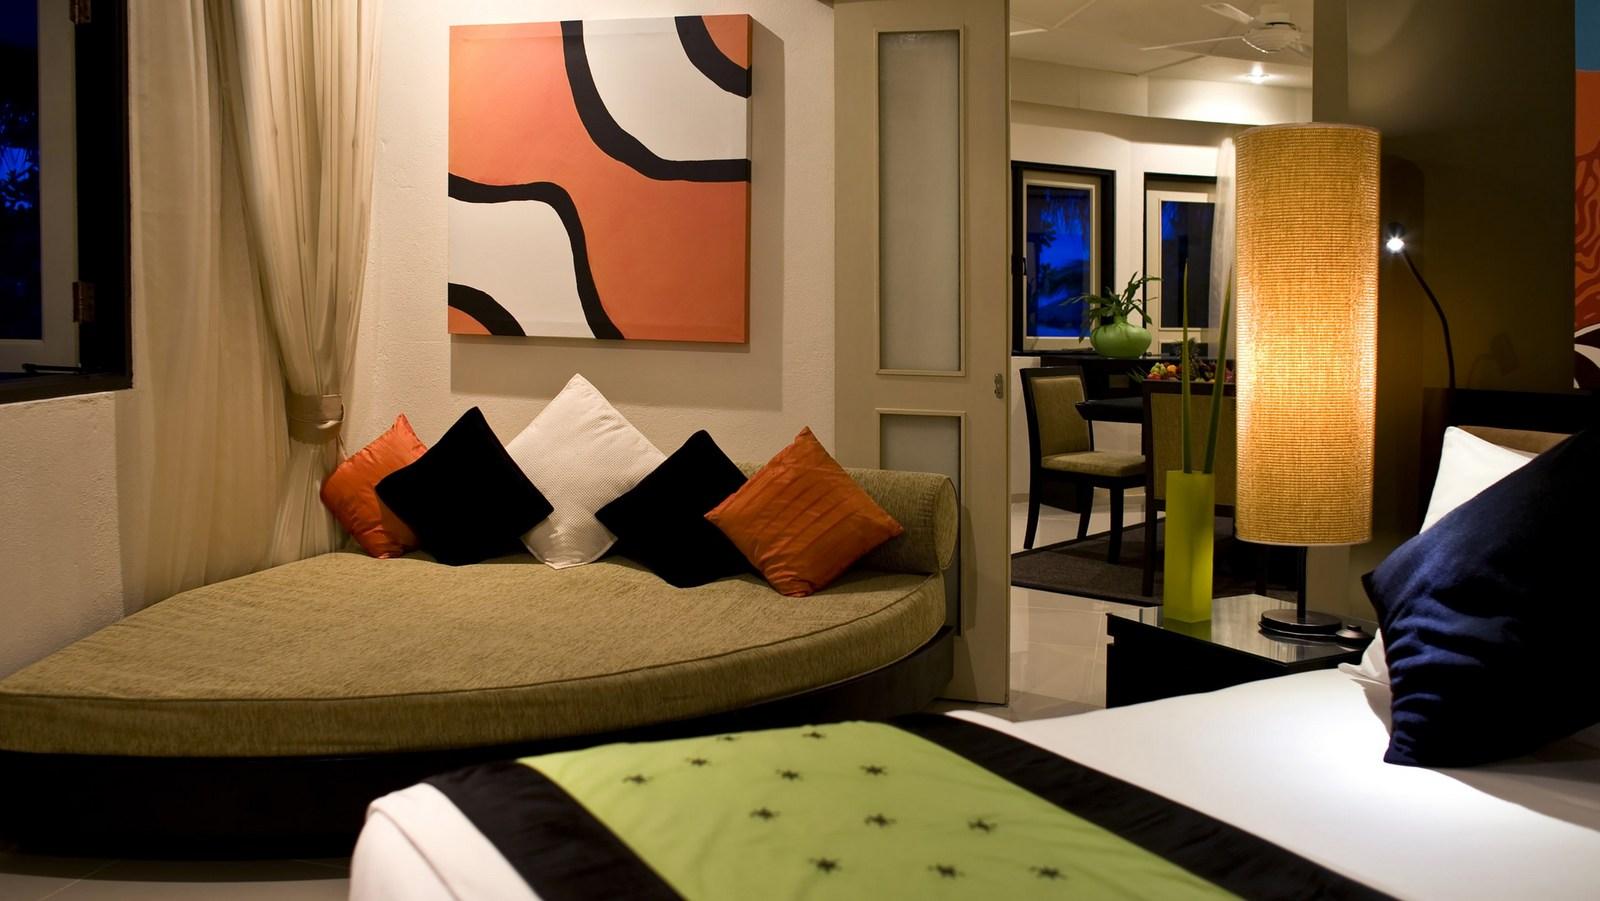 Мальдивы, отель Angsana Velavaru, номер Velavaru Angsana Three Bed Room Villa